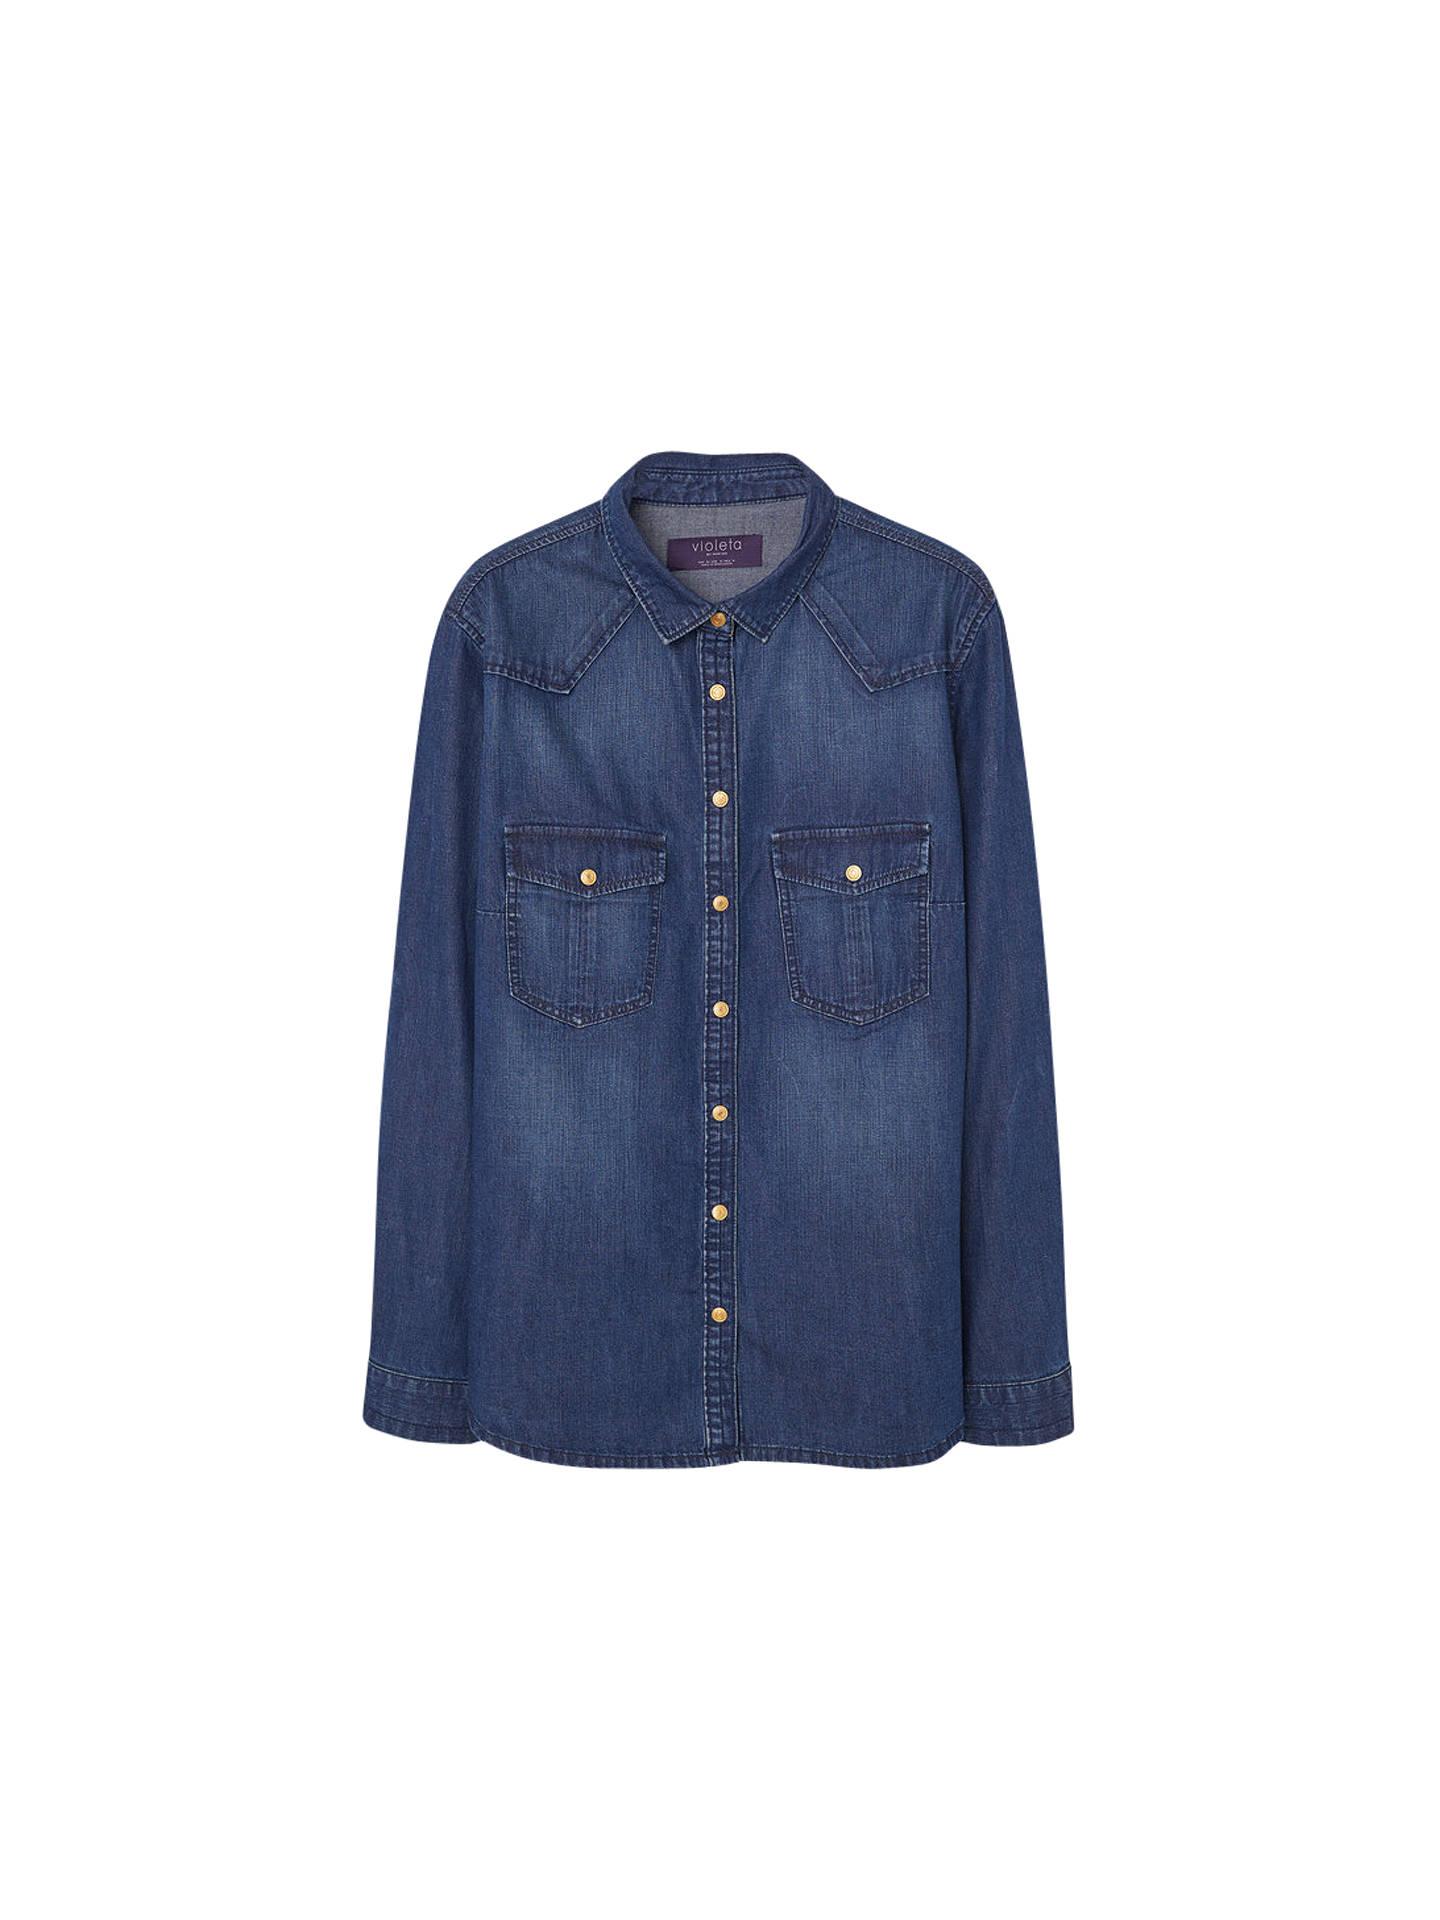 3cf1df4350f Violeta by Mango Denim Shirt at John Lewis   Partners